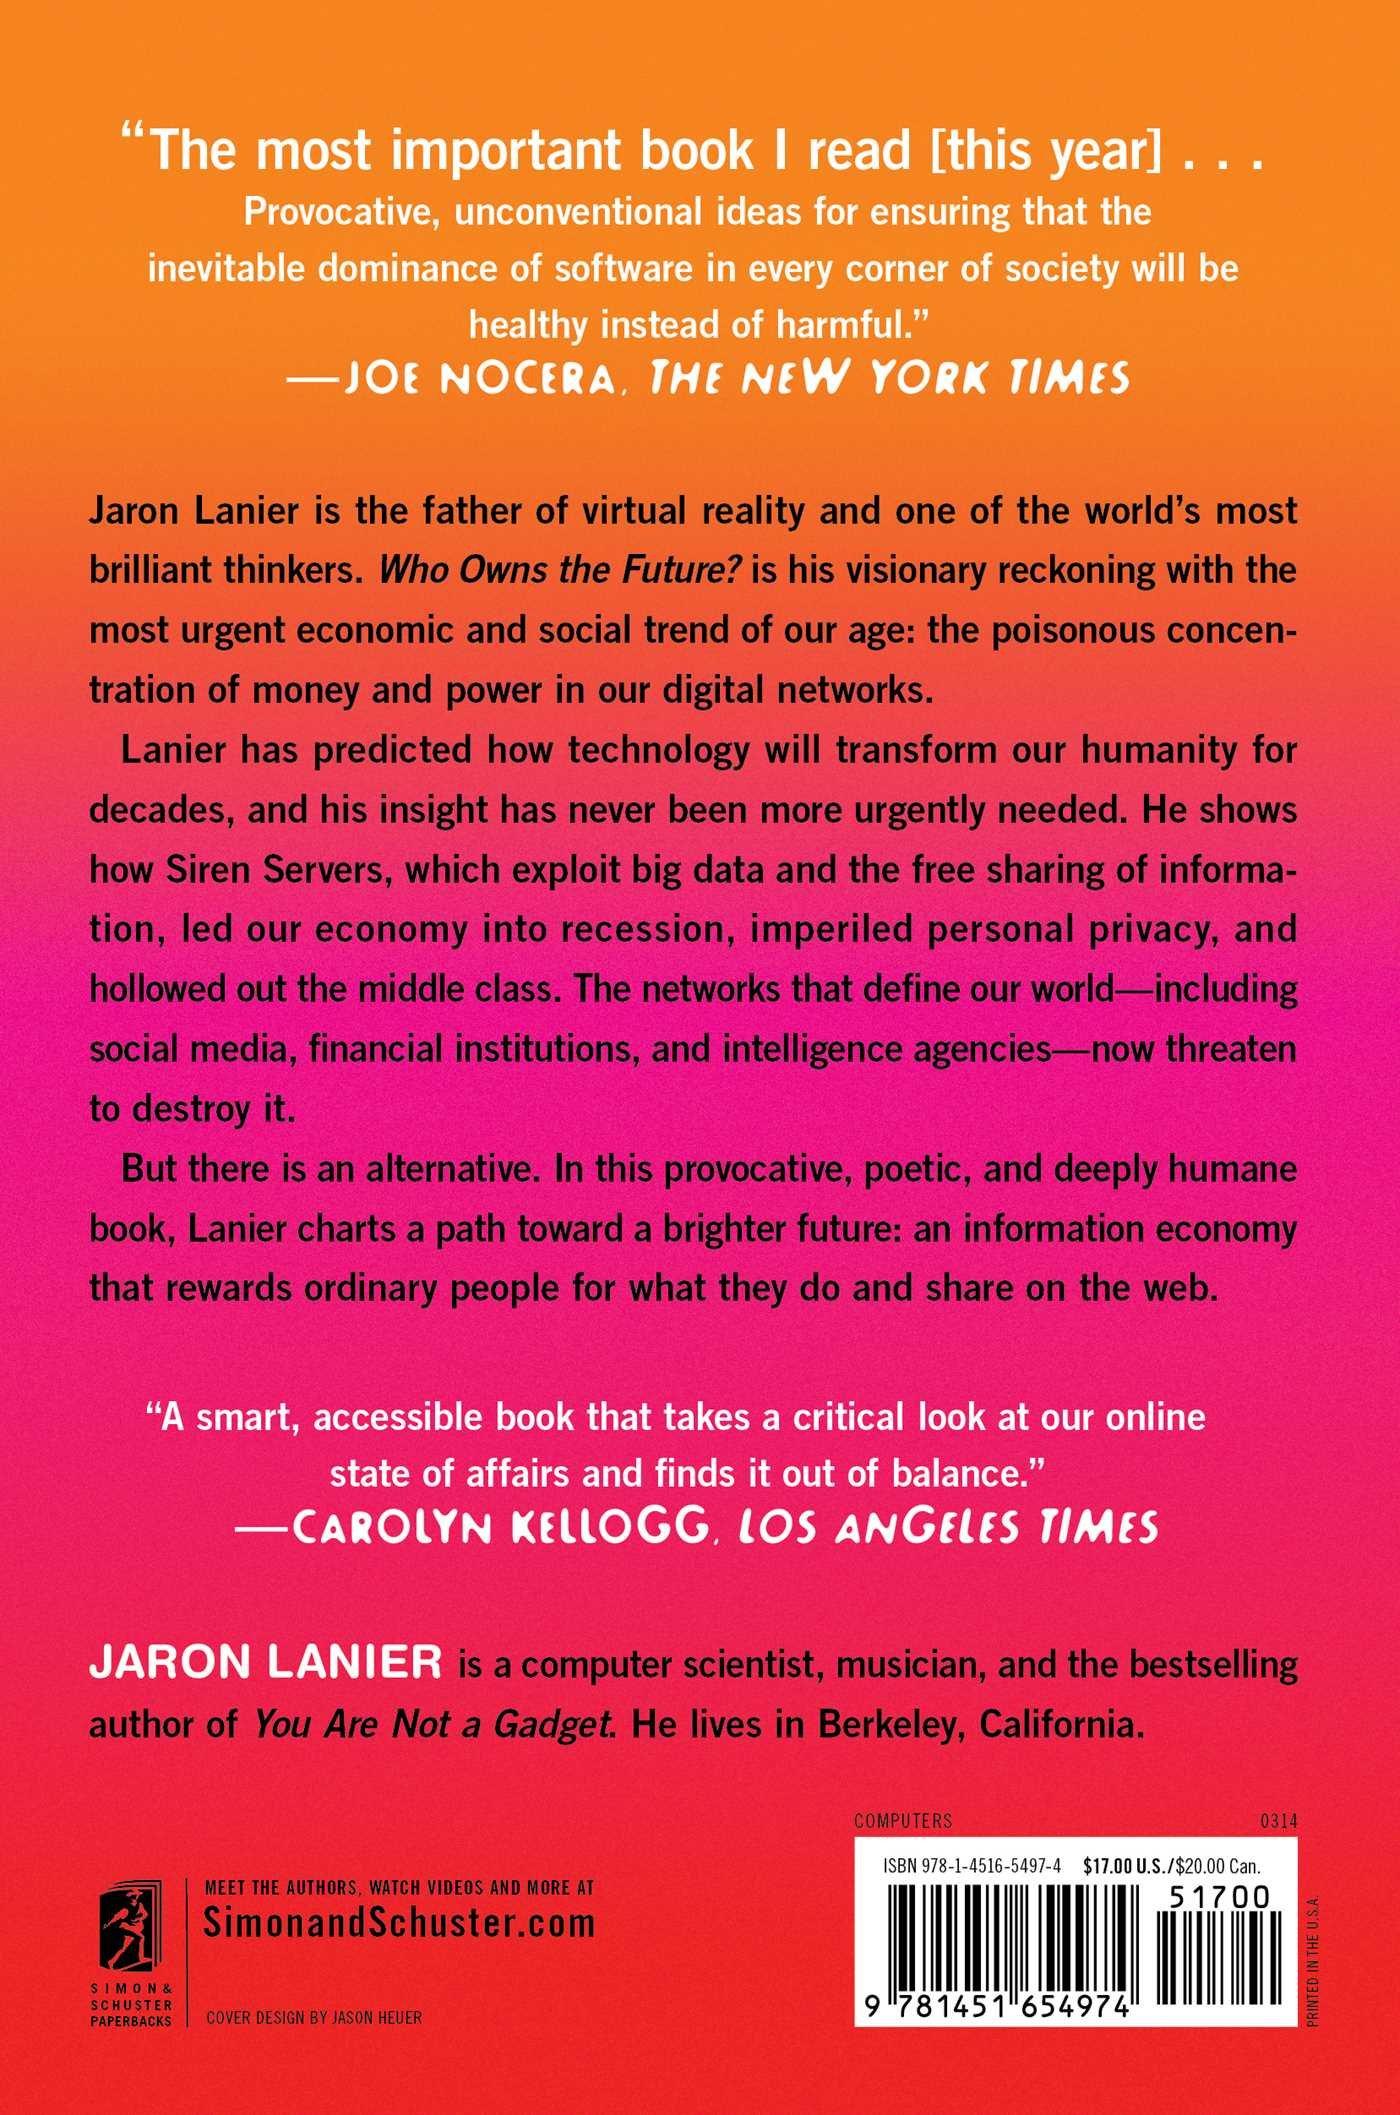 Who Owns the Future?: Amazon.es: Jaron Lanier: Libros en ...